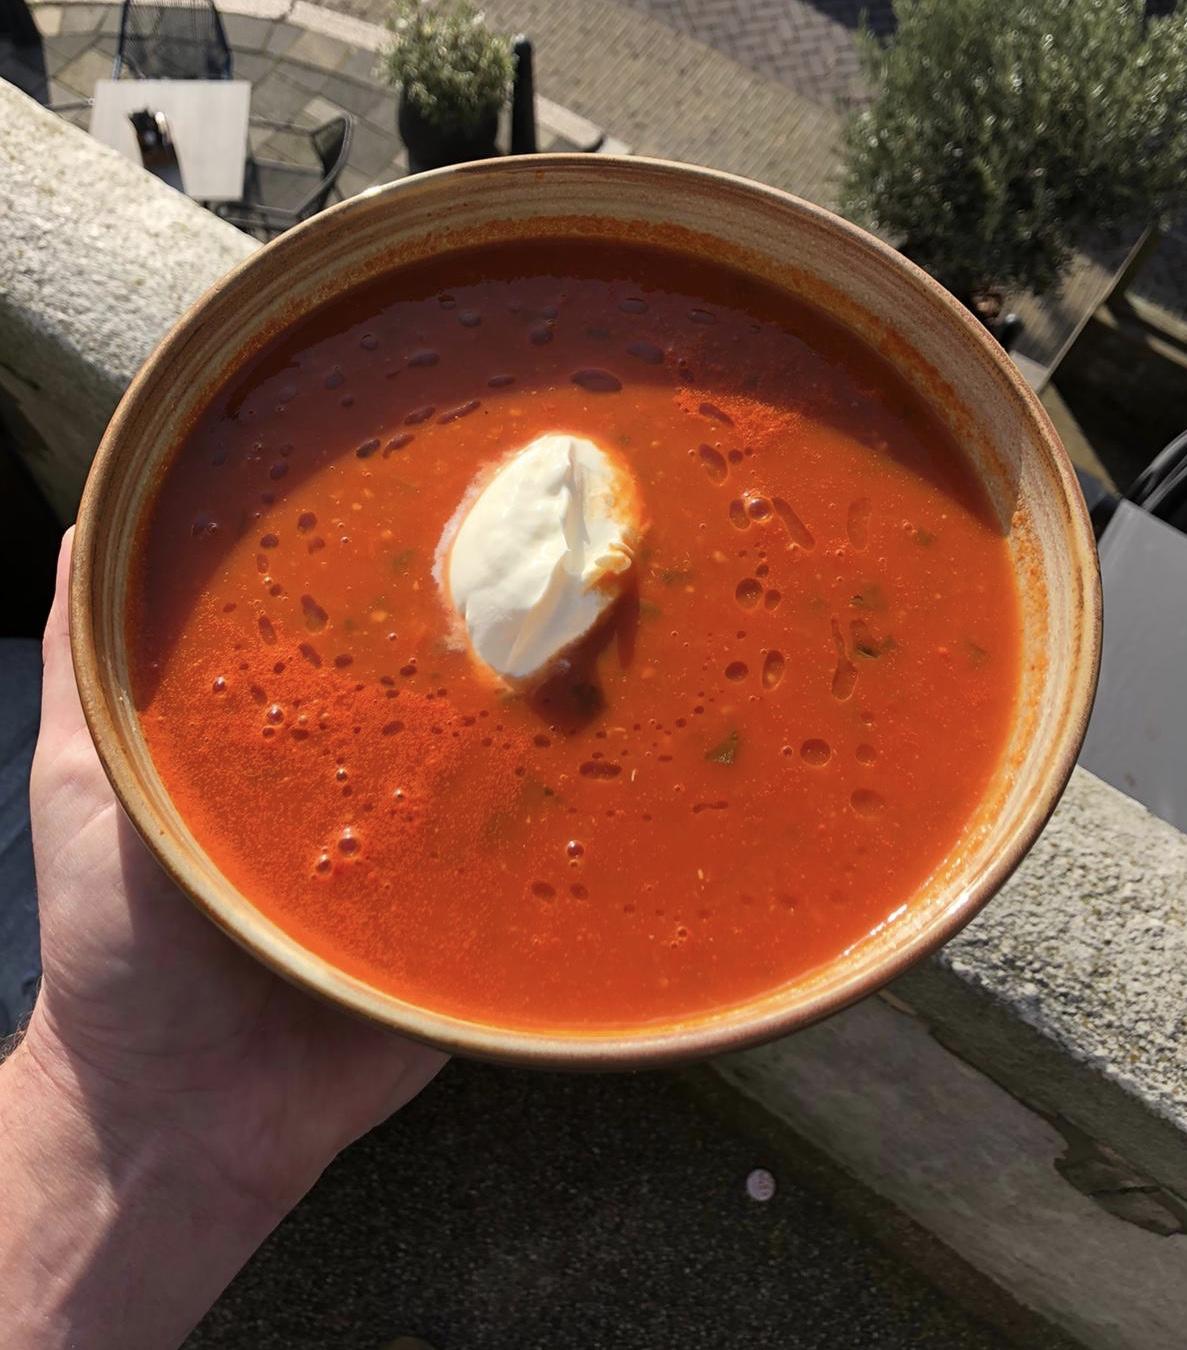 Gezond eten bezorgen bestellen afhalen Dordrecht - Tomatensoep Finn's Eten en drinken Blauwepoortsplein